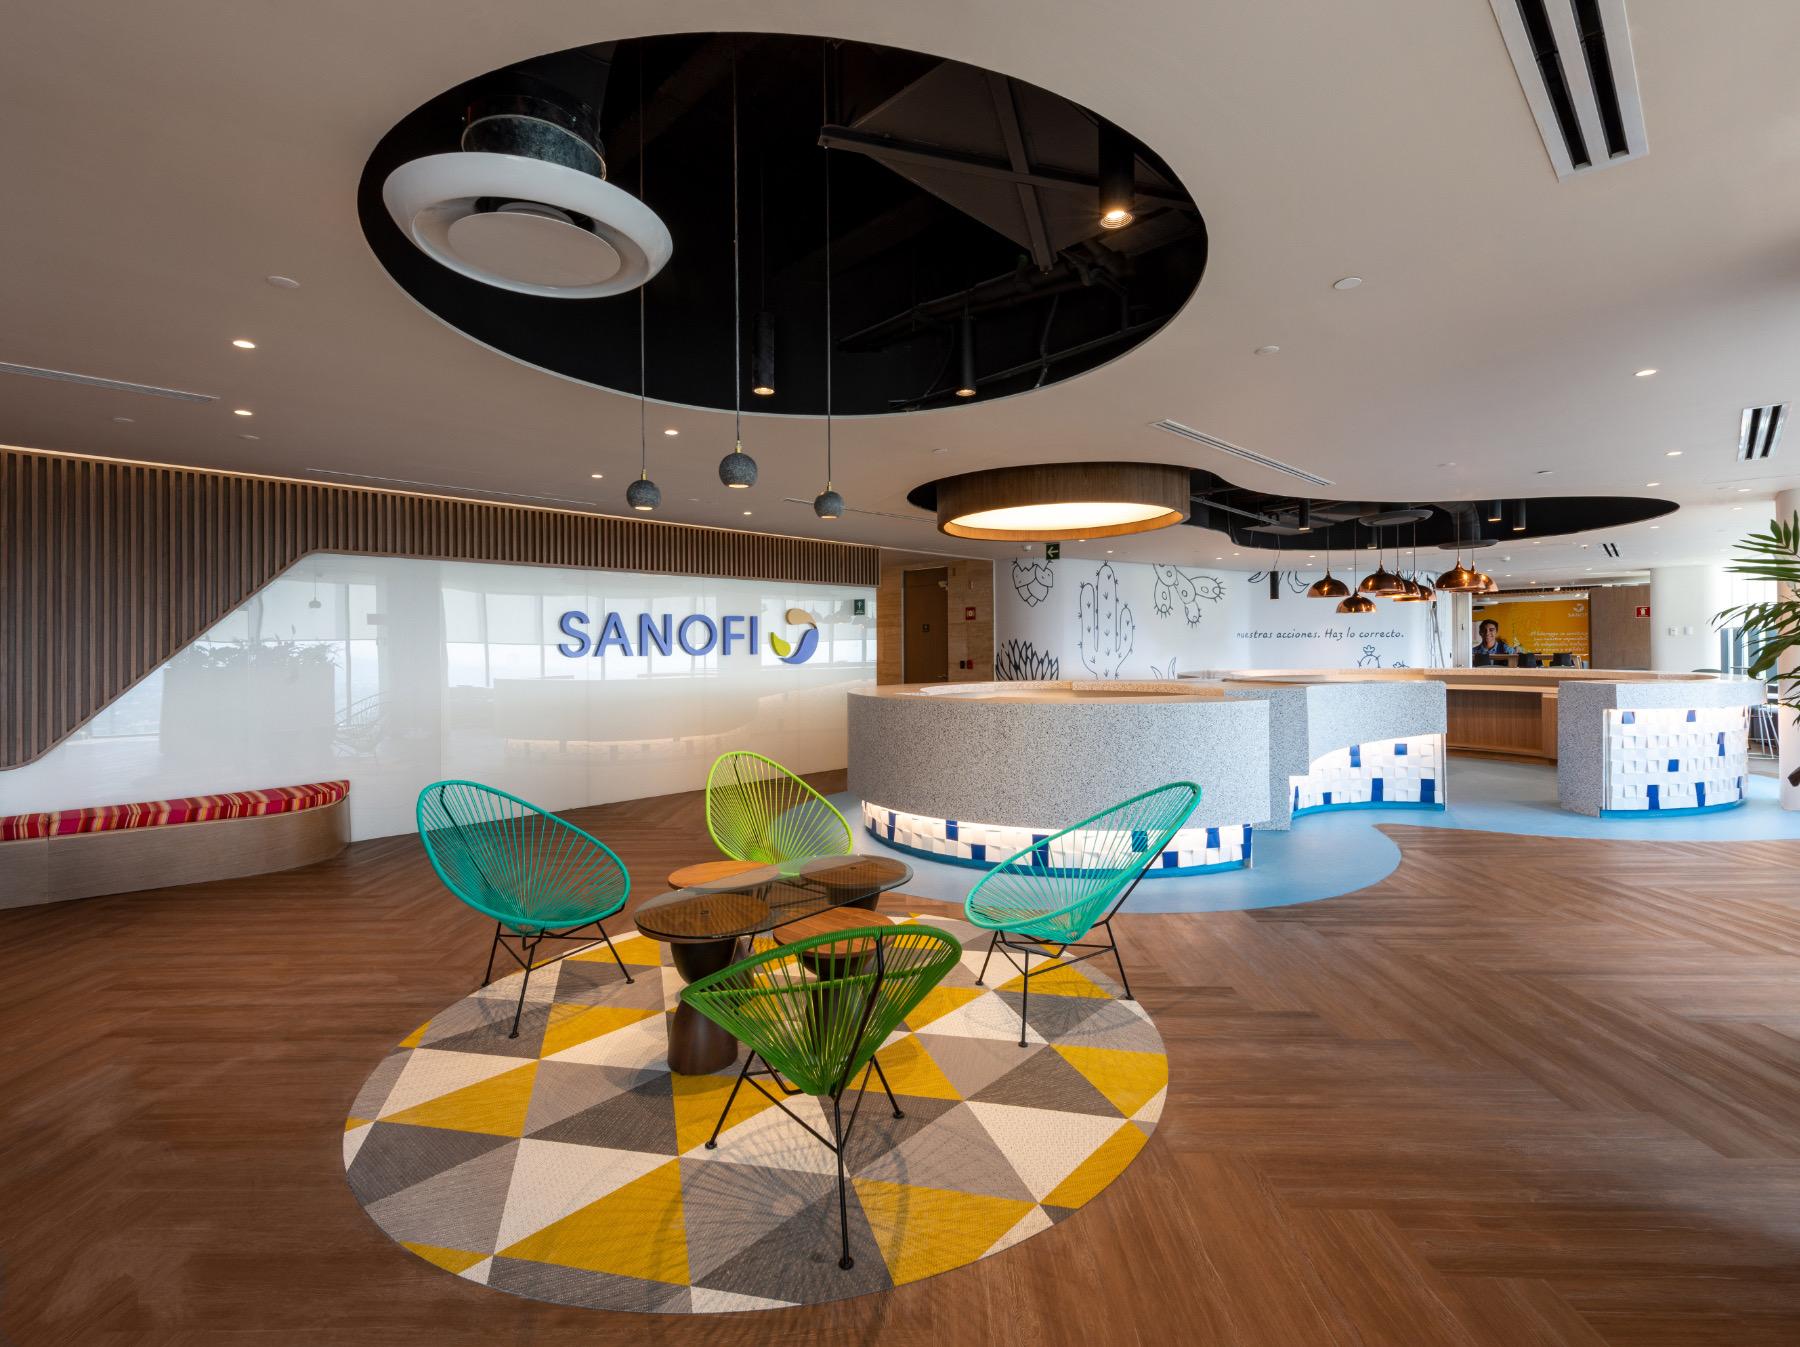 sanofi-mexico-city-office-1